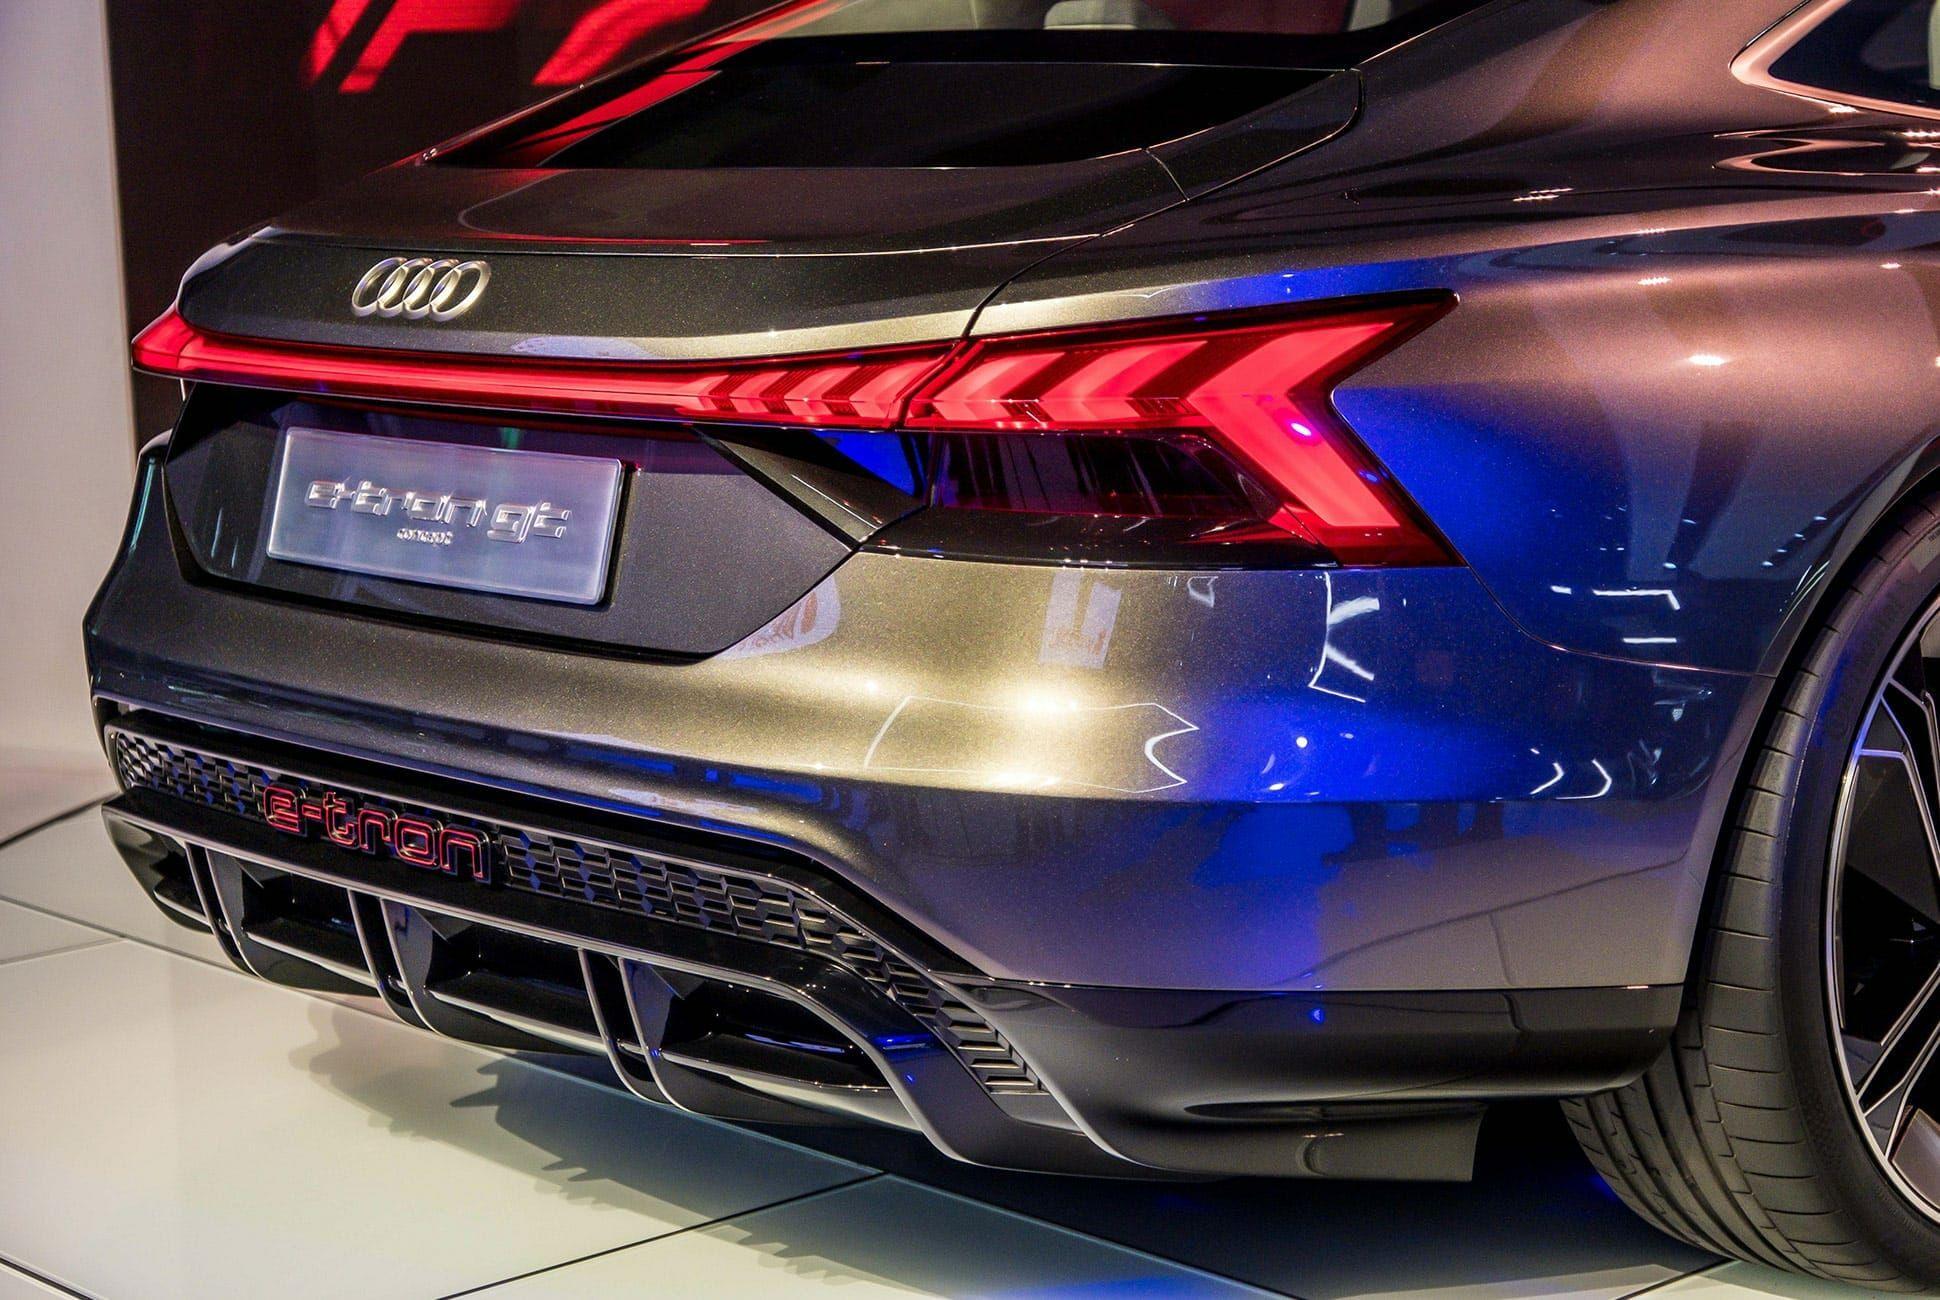 Top-10-LA-Auto-Show-Cars-gear-patrol-Audi-E-Tron-GT-slide-4